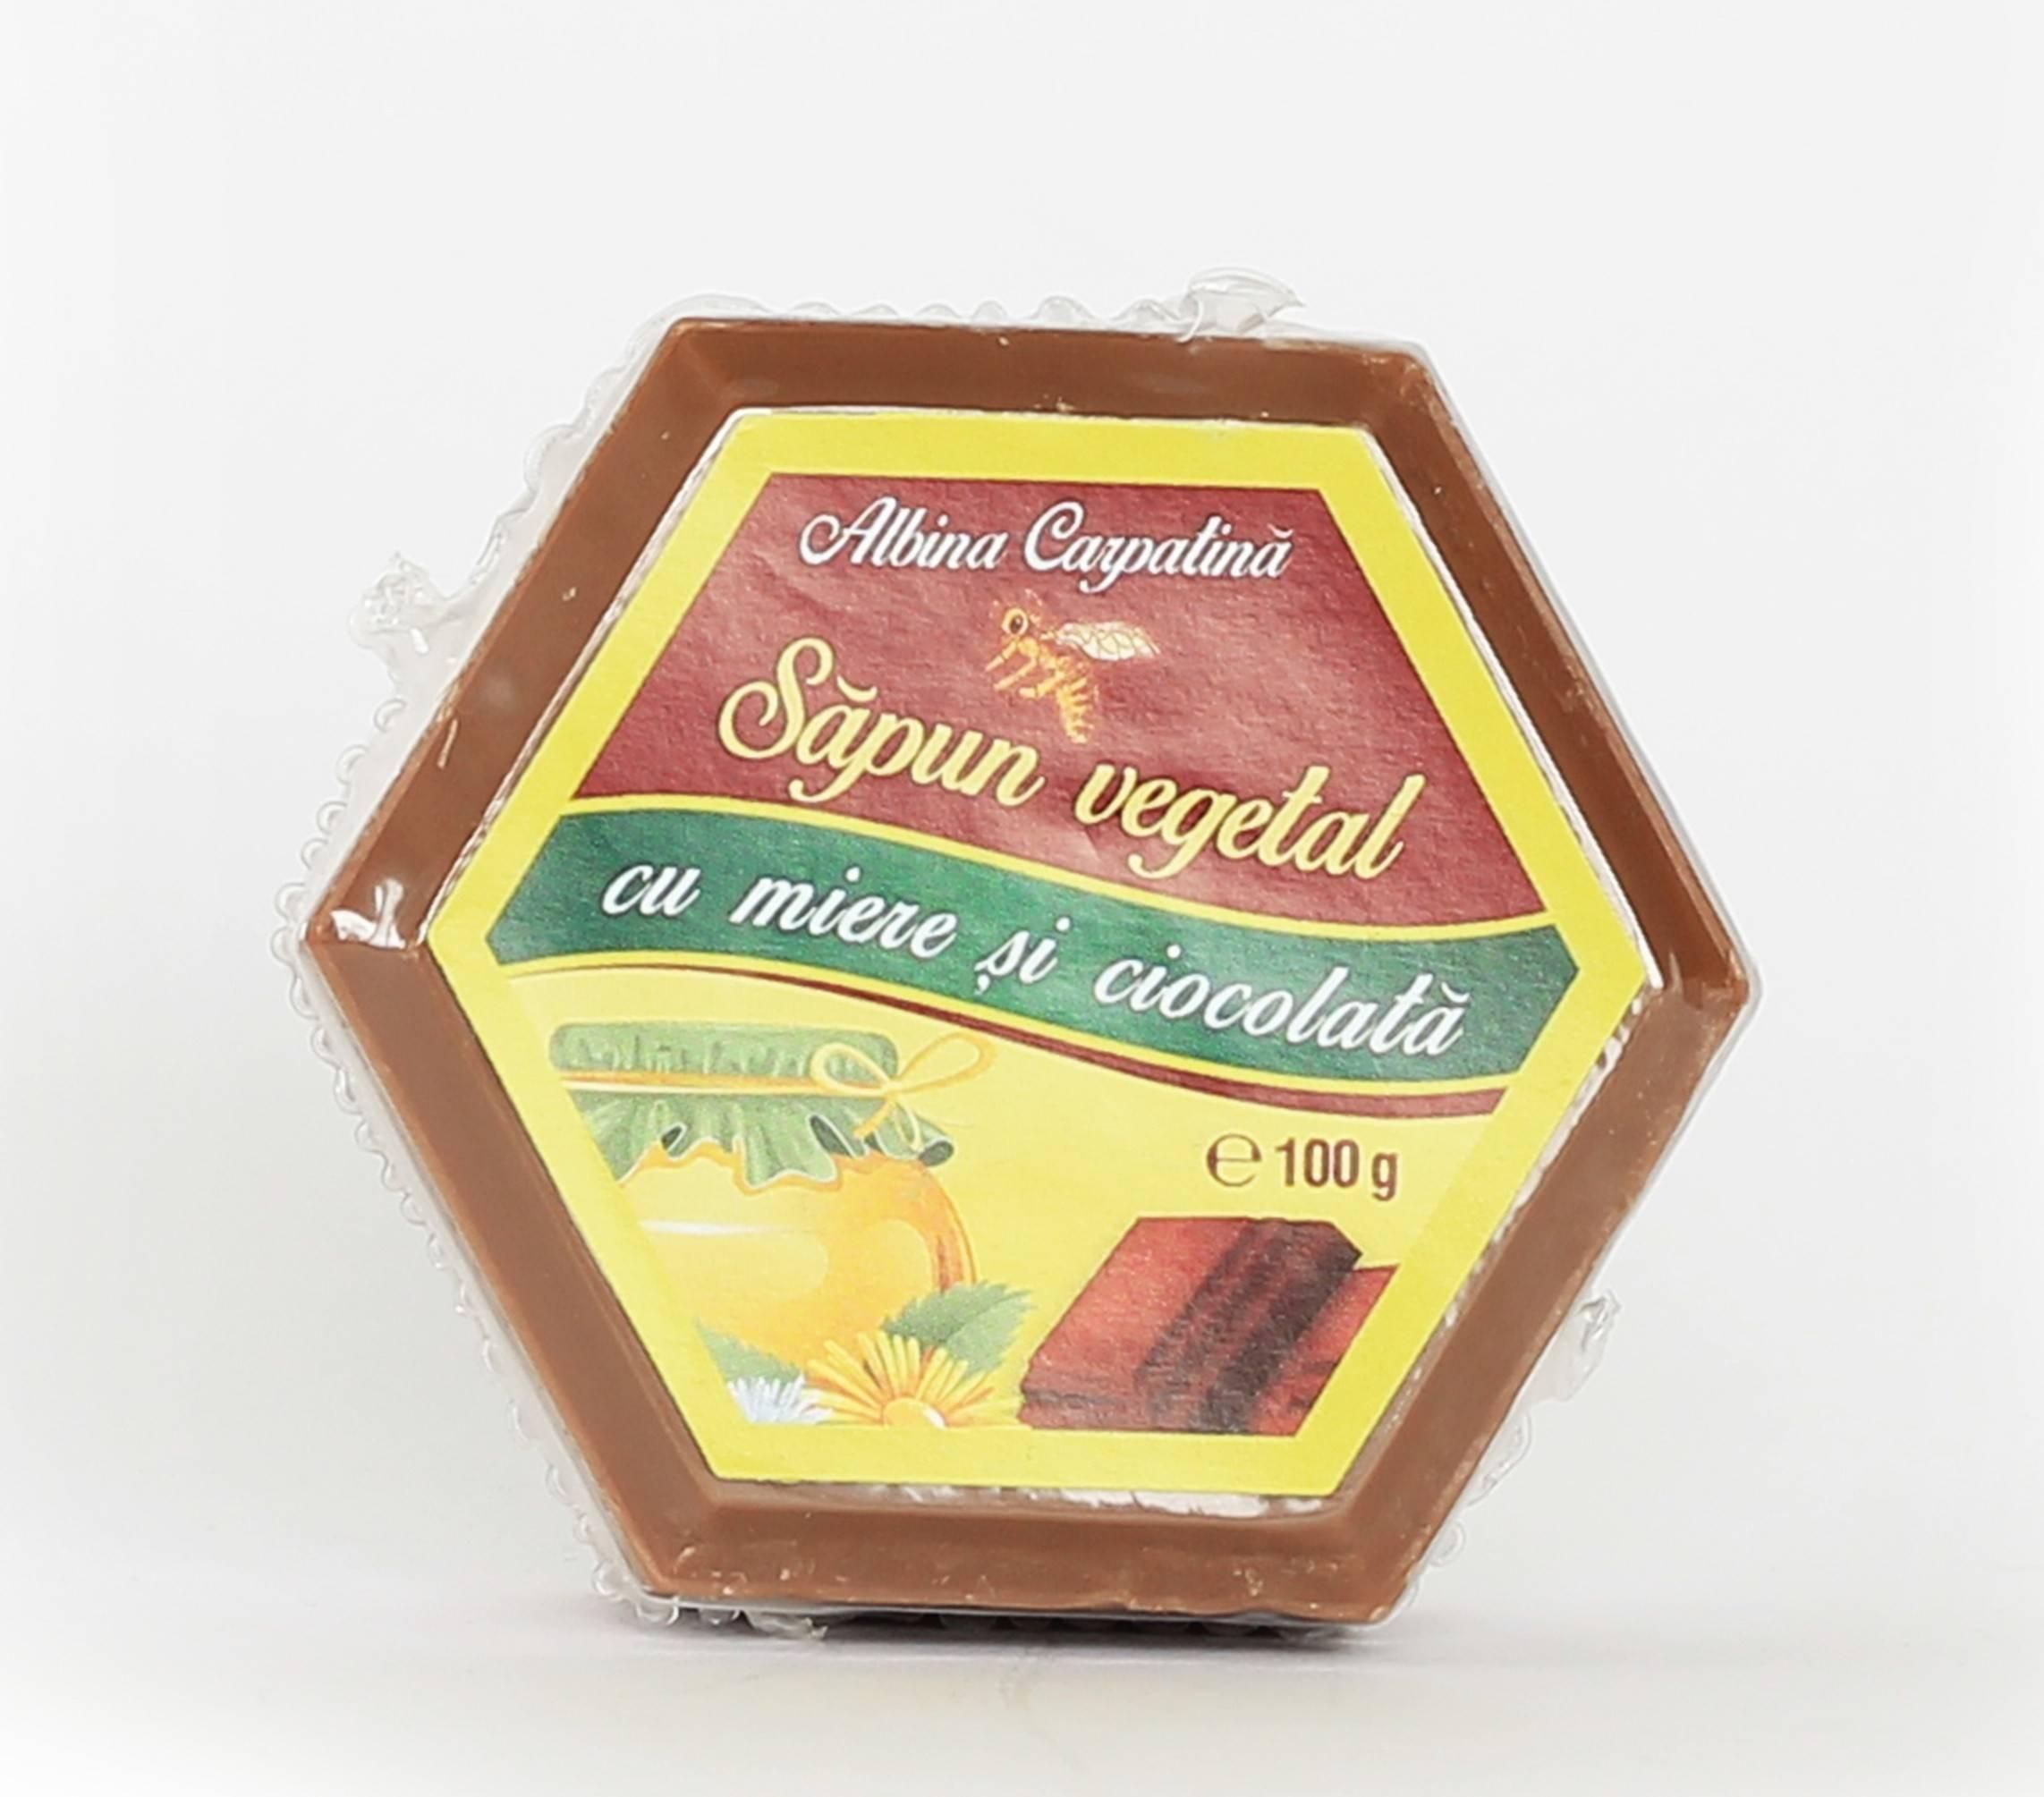 sapun cu miere si ciocolata albina carpatina